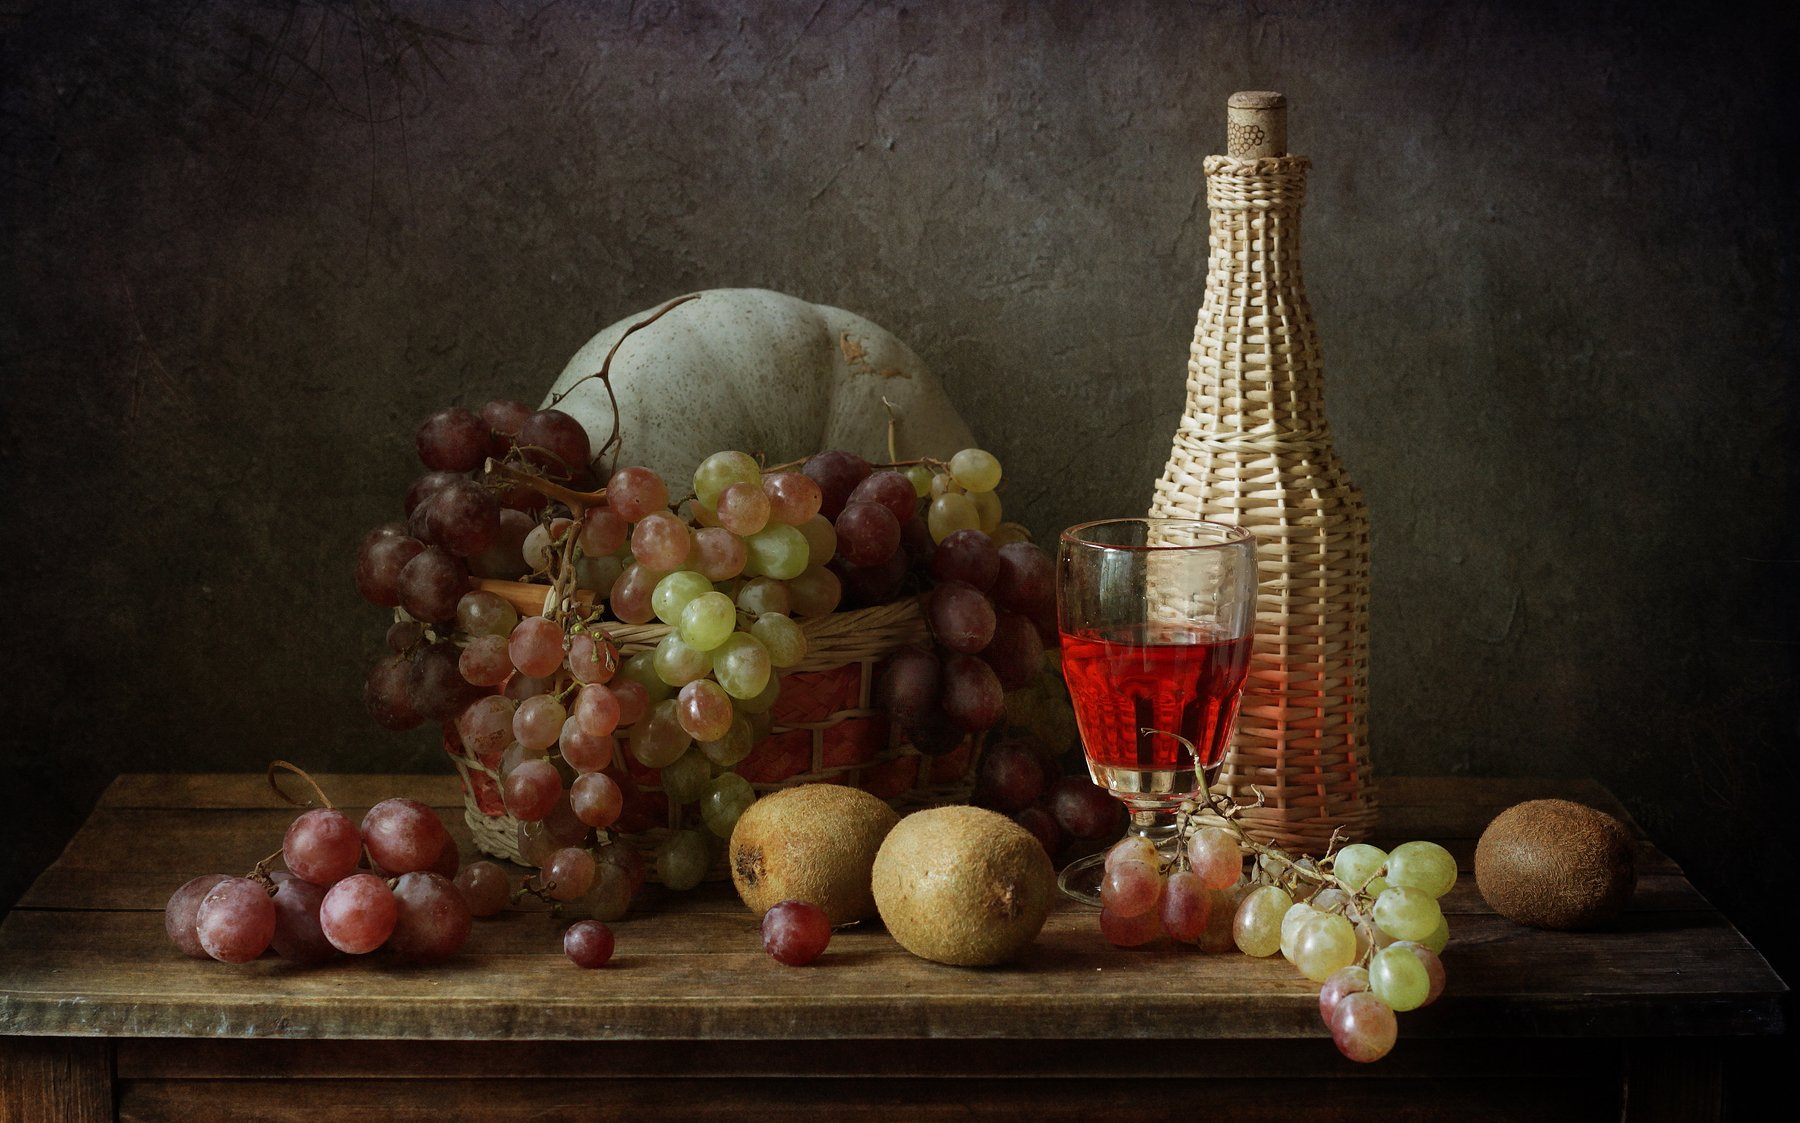 виноград. бутылка, тыква, киви, фрукты, натюрморт, Рябикова-Багузова Галина